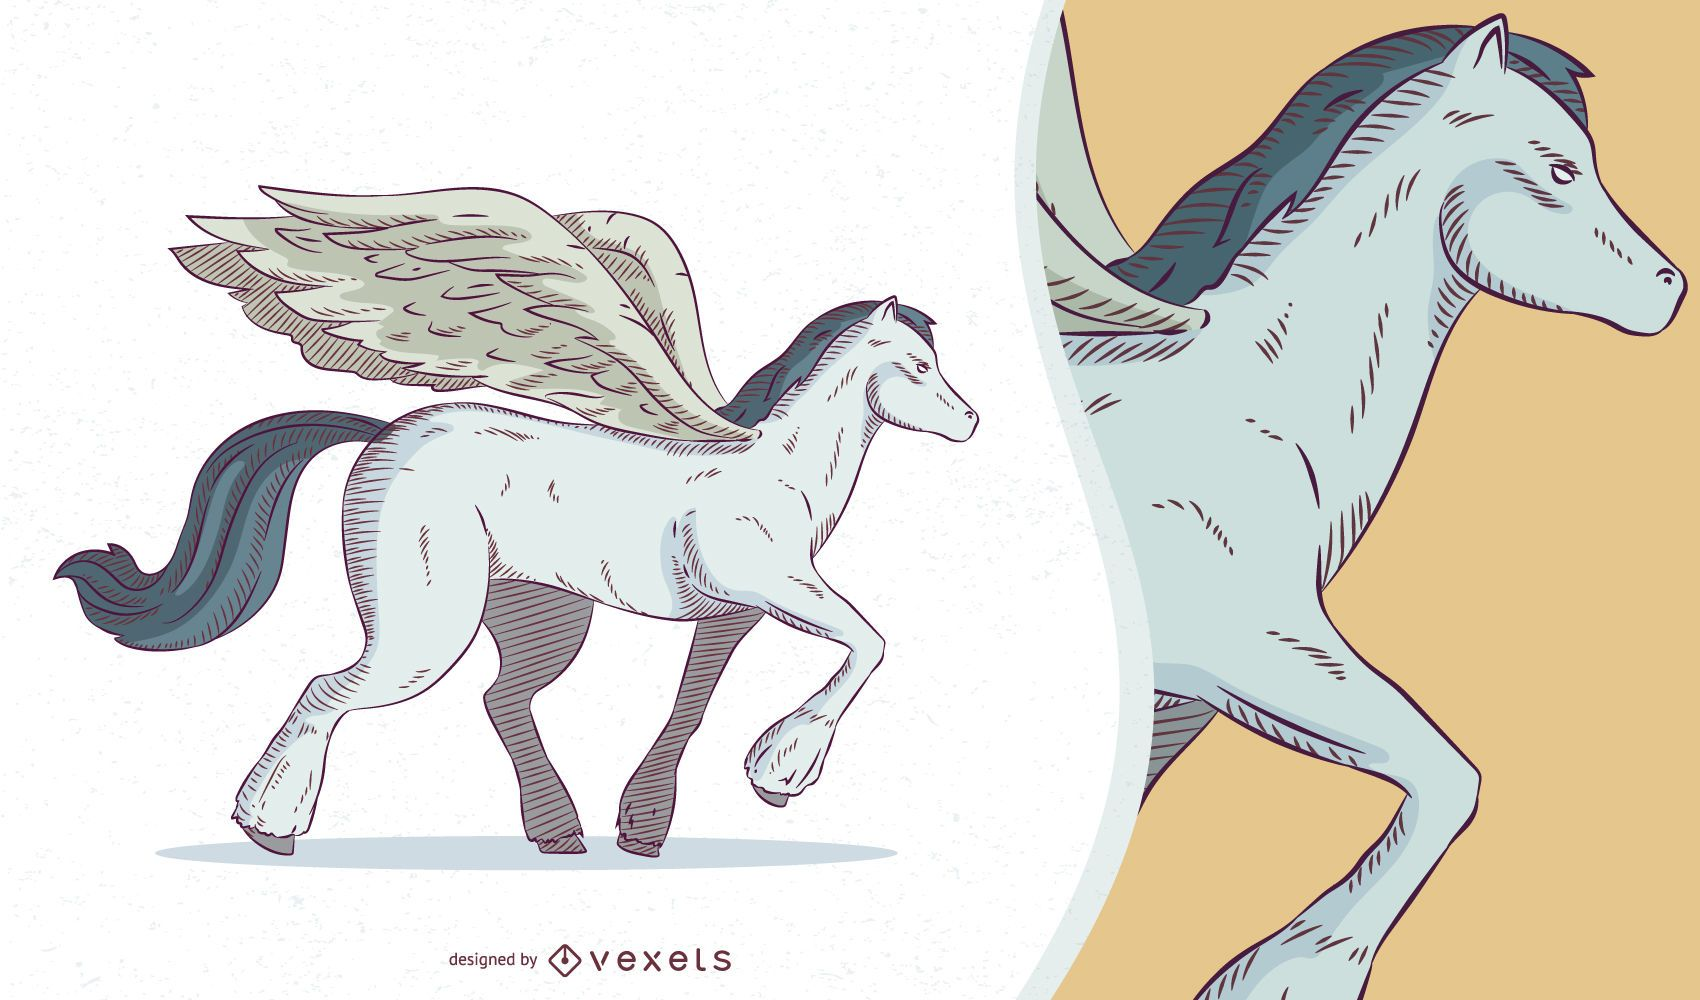 Pegasus Mythical Creature Illustration